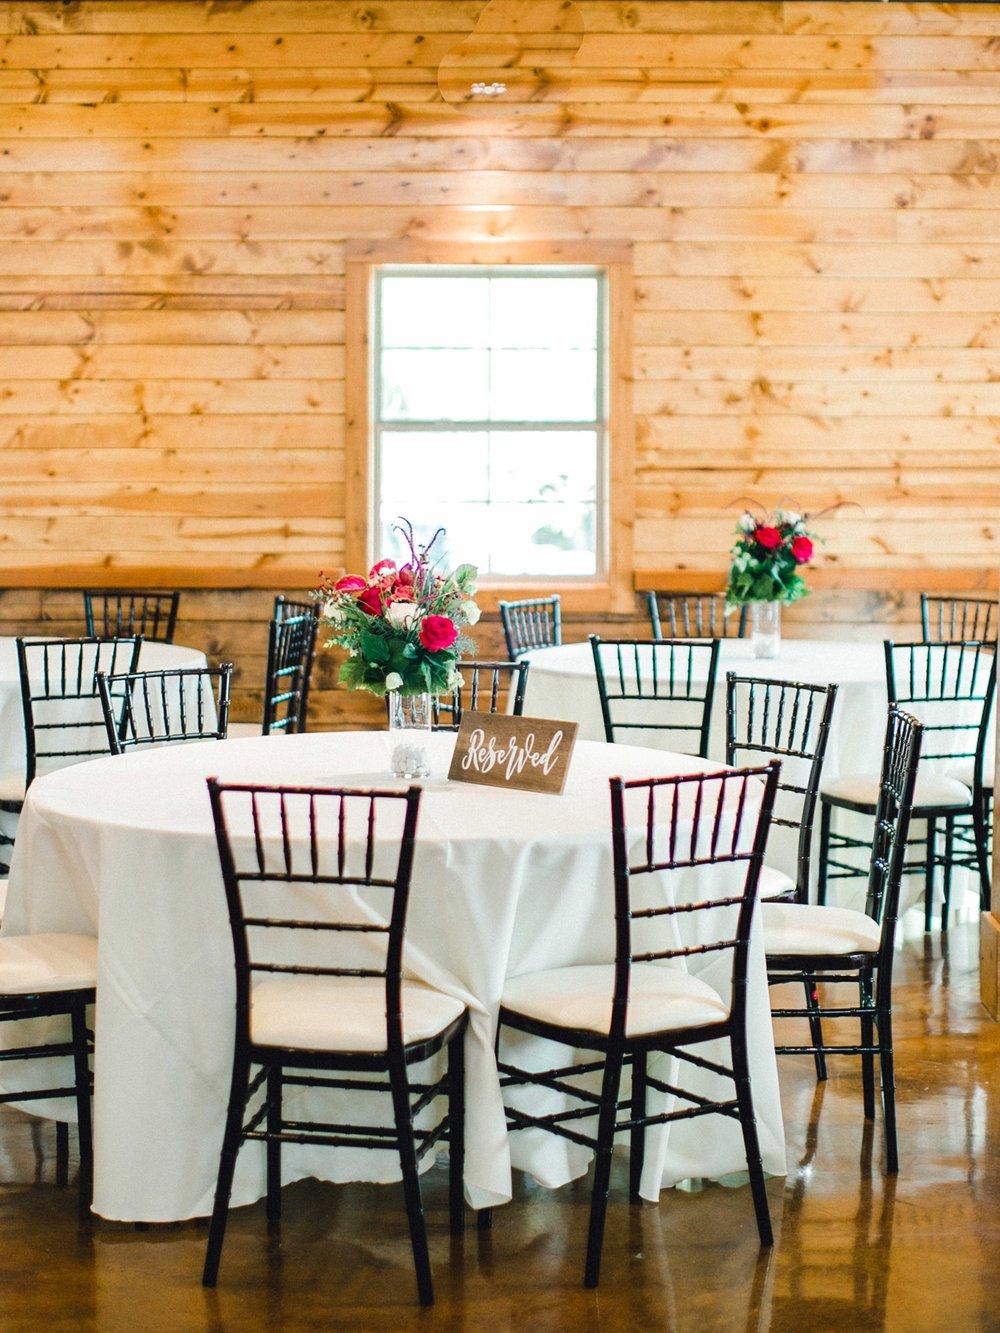 Aleah_and_Rowdy_Fenwick_Hidden_Creek_Events_Heath_Texas_Lubbock_Photographer_ALLEEJ_Weddings_0129.jpg